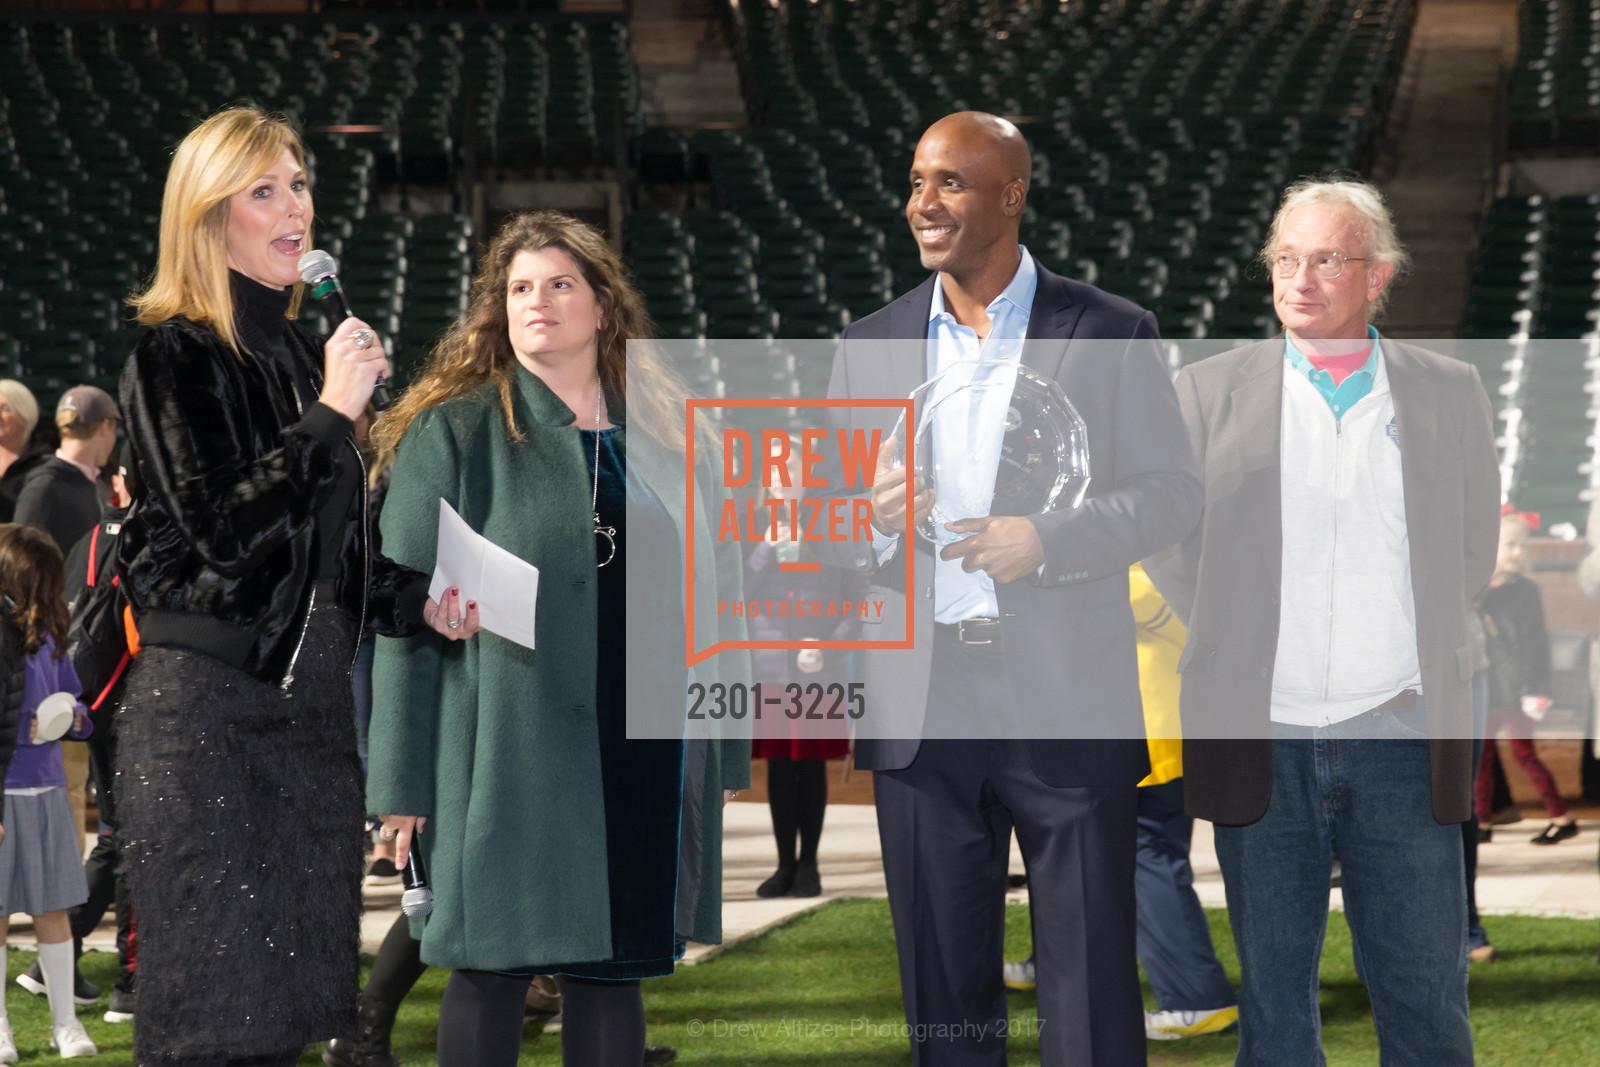 Mendy Calegari, Amy Wender-Hoch, Barry Bonds, Mike Herbst, Photo #2301-3225